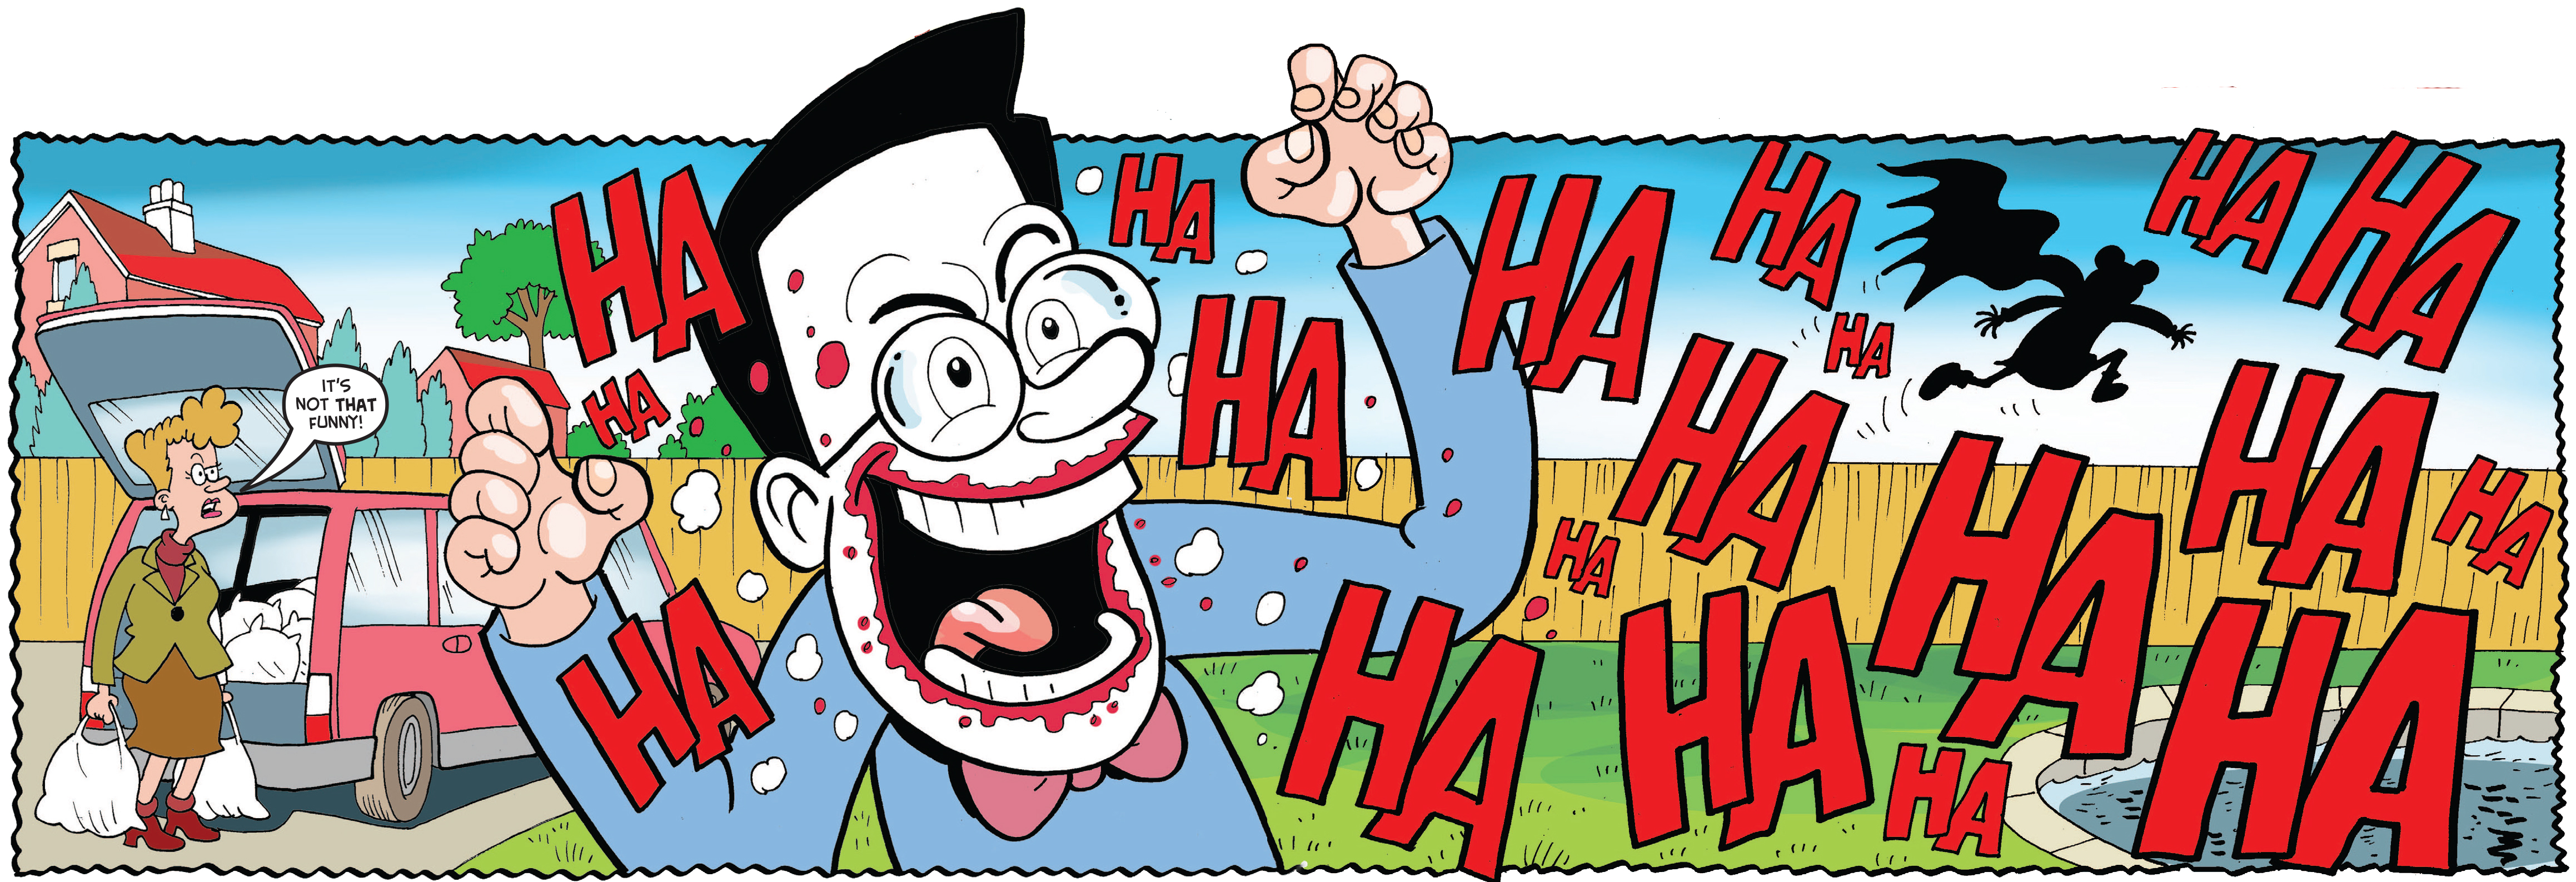 Walter becomes the Joker